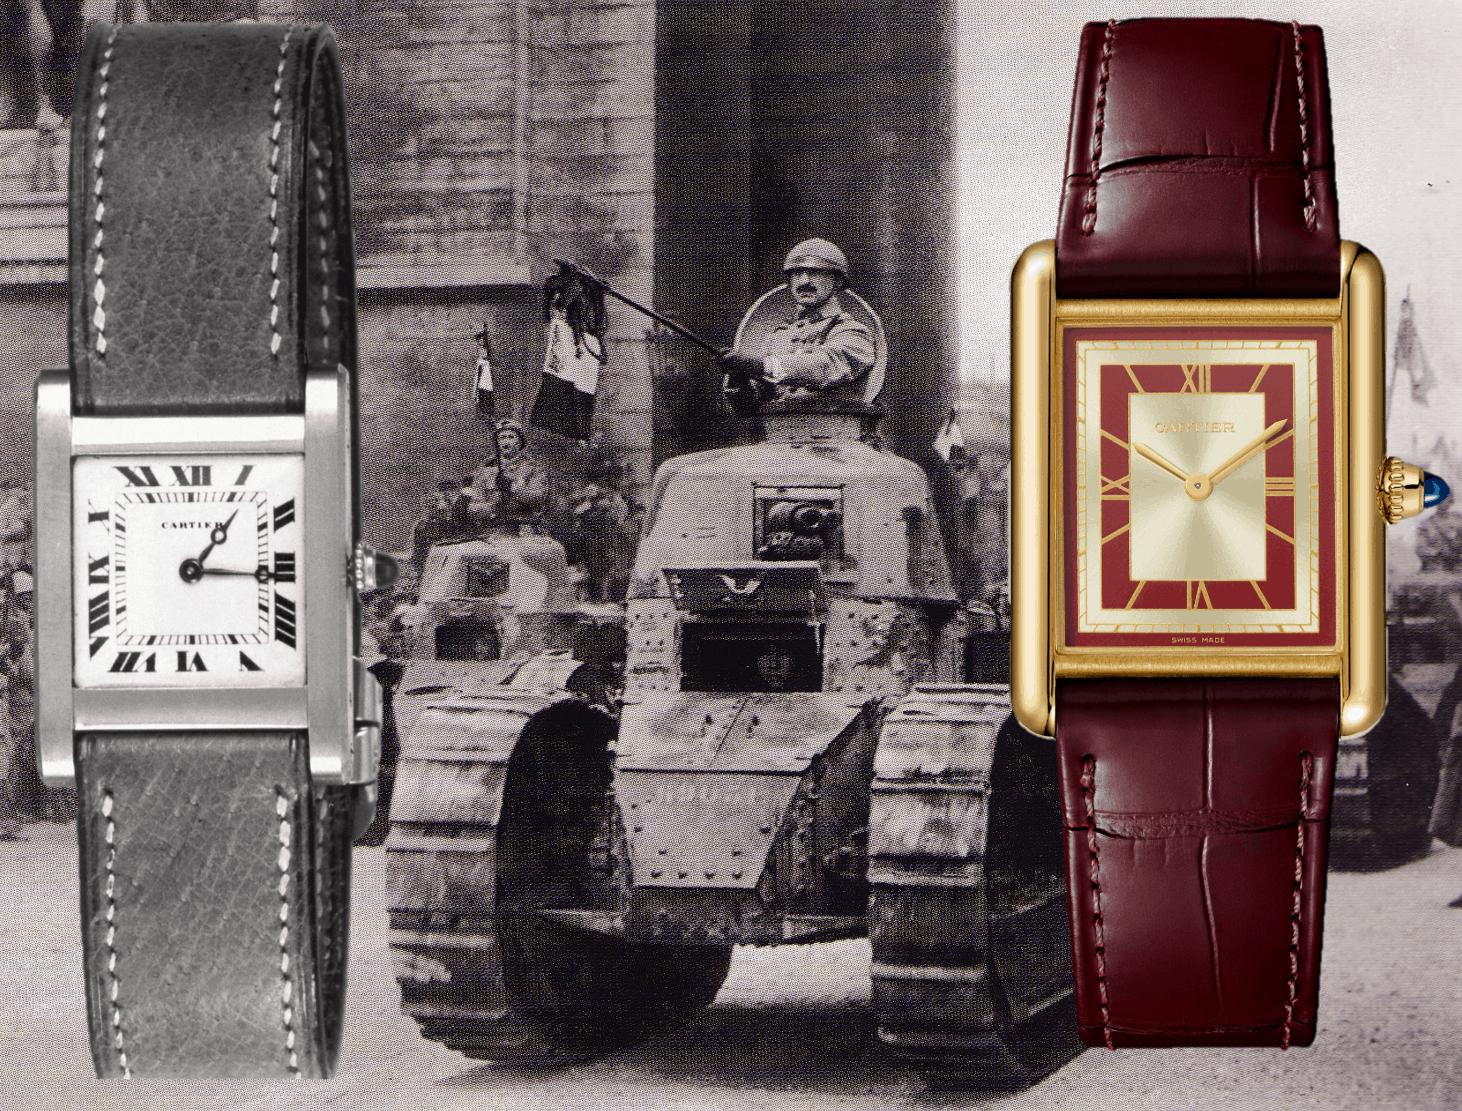 Cartier-Tank-1919-Cartier-Tank-Louis-Cartier-2021-Uhrenkosmos